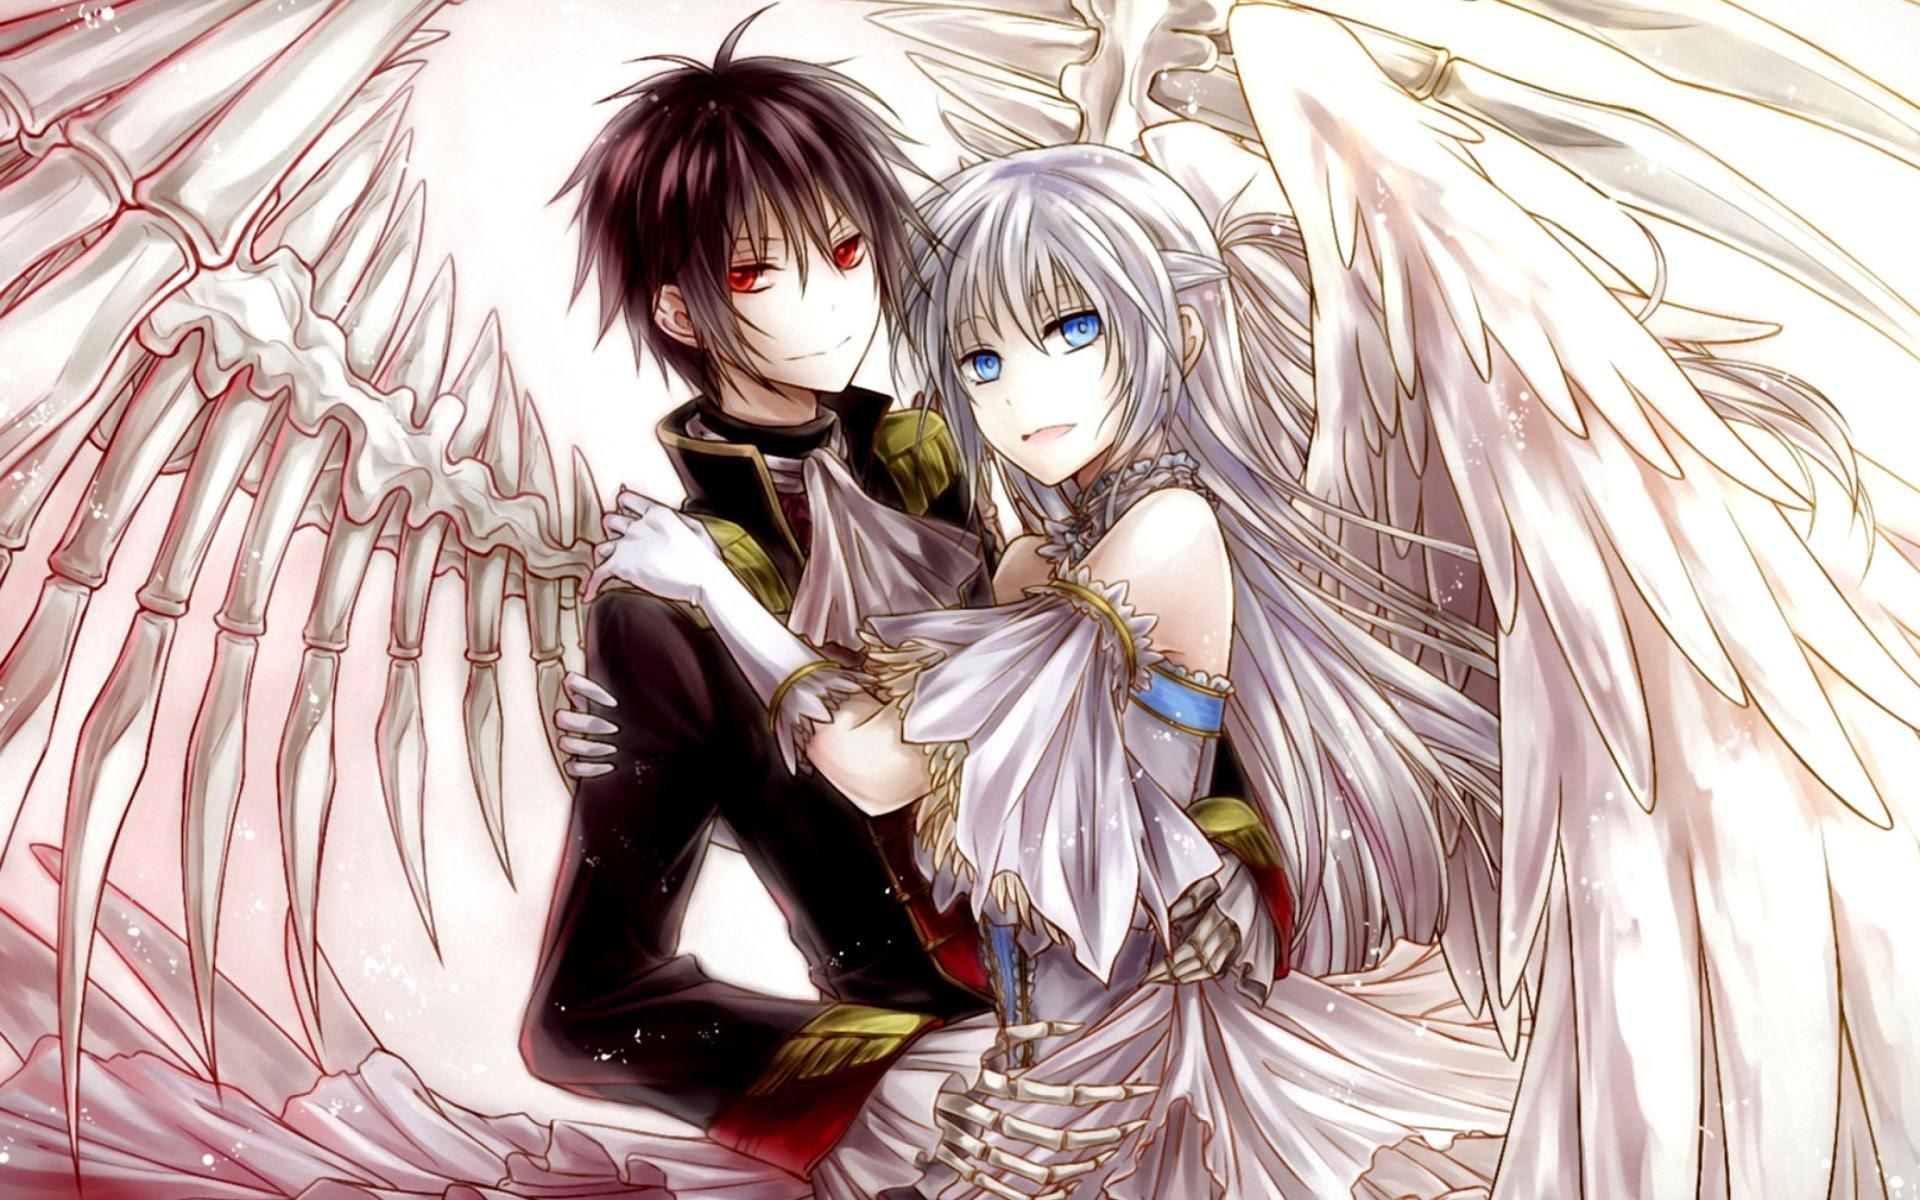 Unduh 67 Wallpaper Anime Couple Keren HD Terbaru